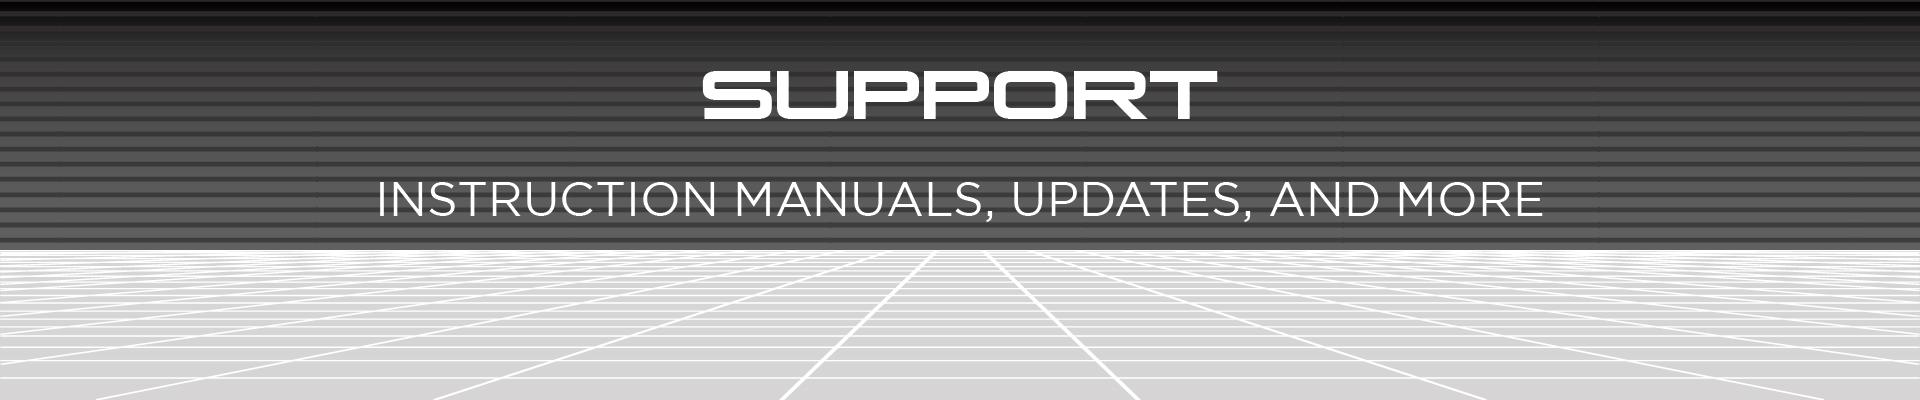 Support, Manuals, Retro-Bit, Update, Firmware, help, guide